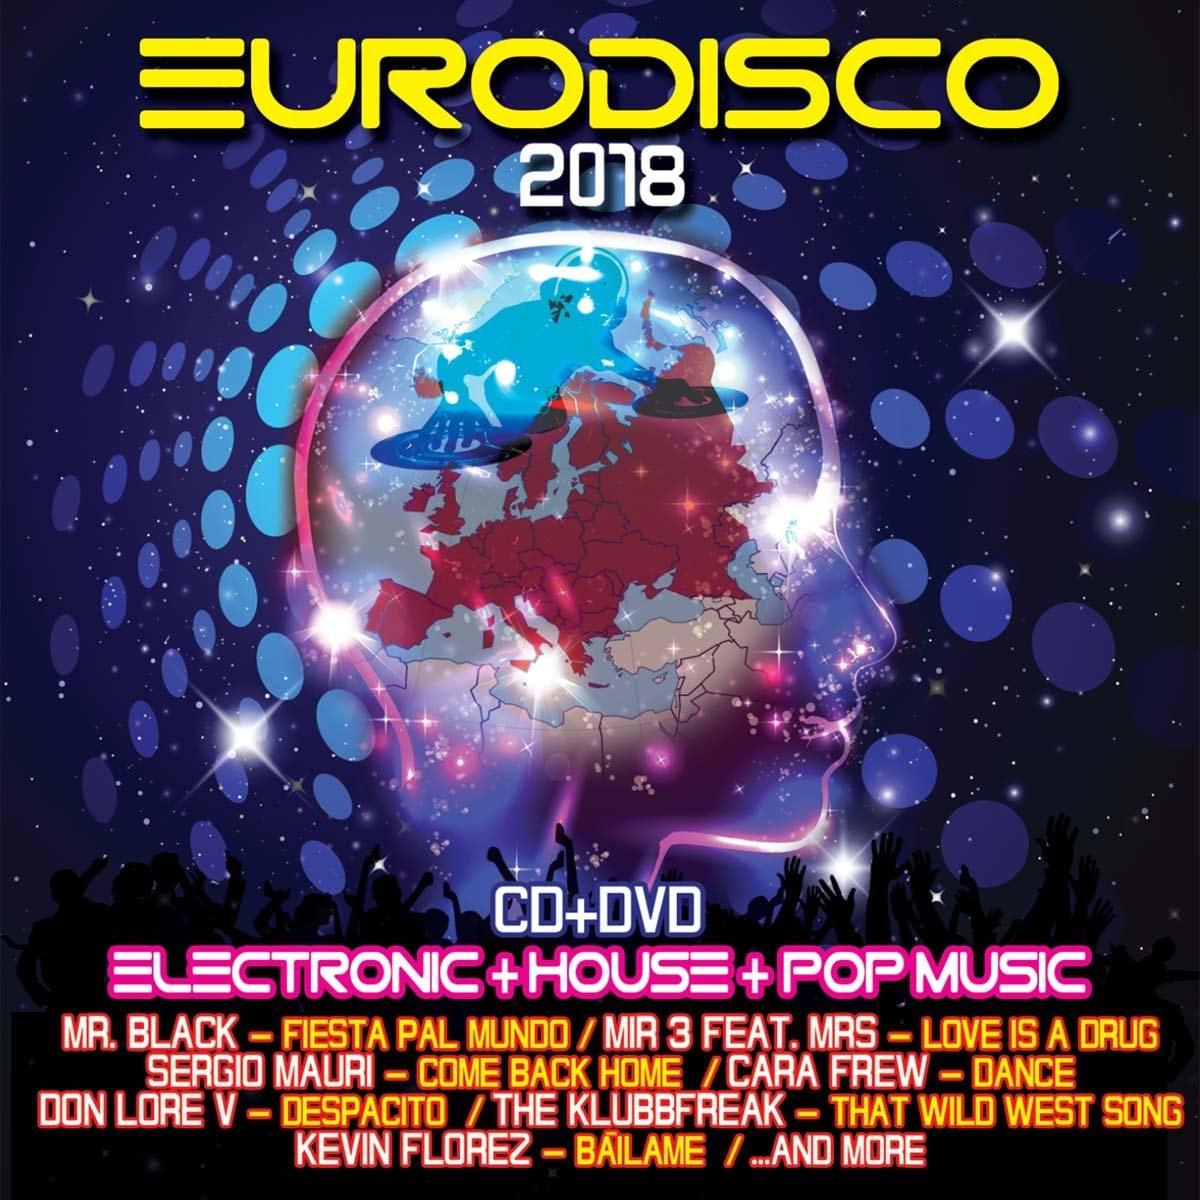 Cd + Dvd Eurodisco Electronic + House + Popmusic 2018